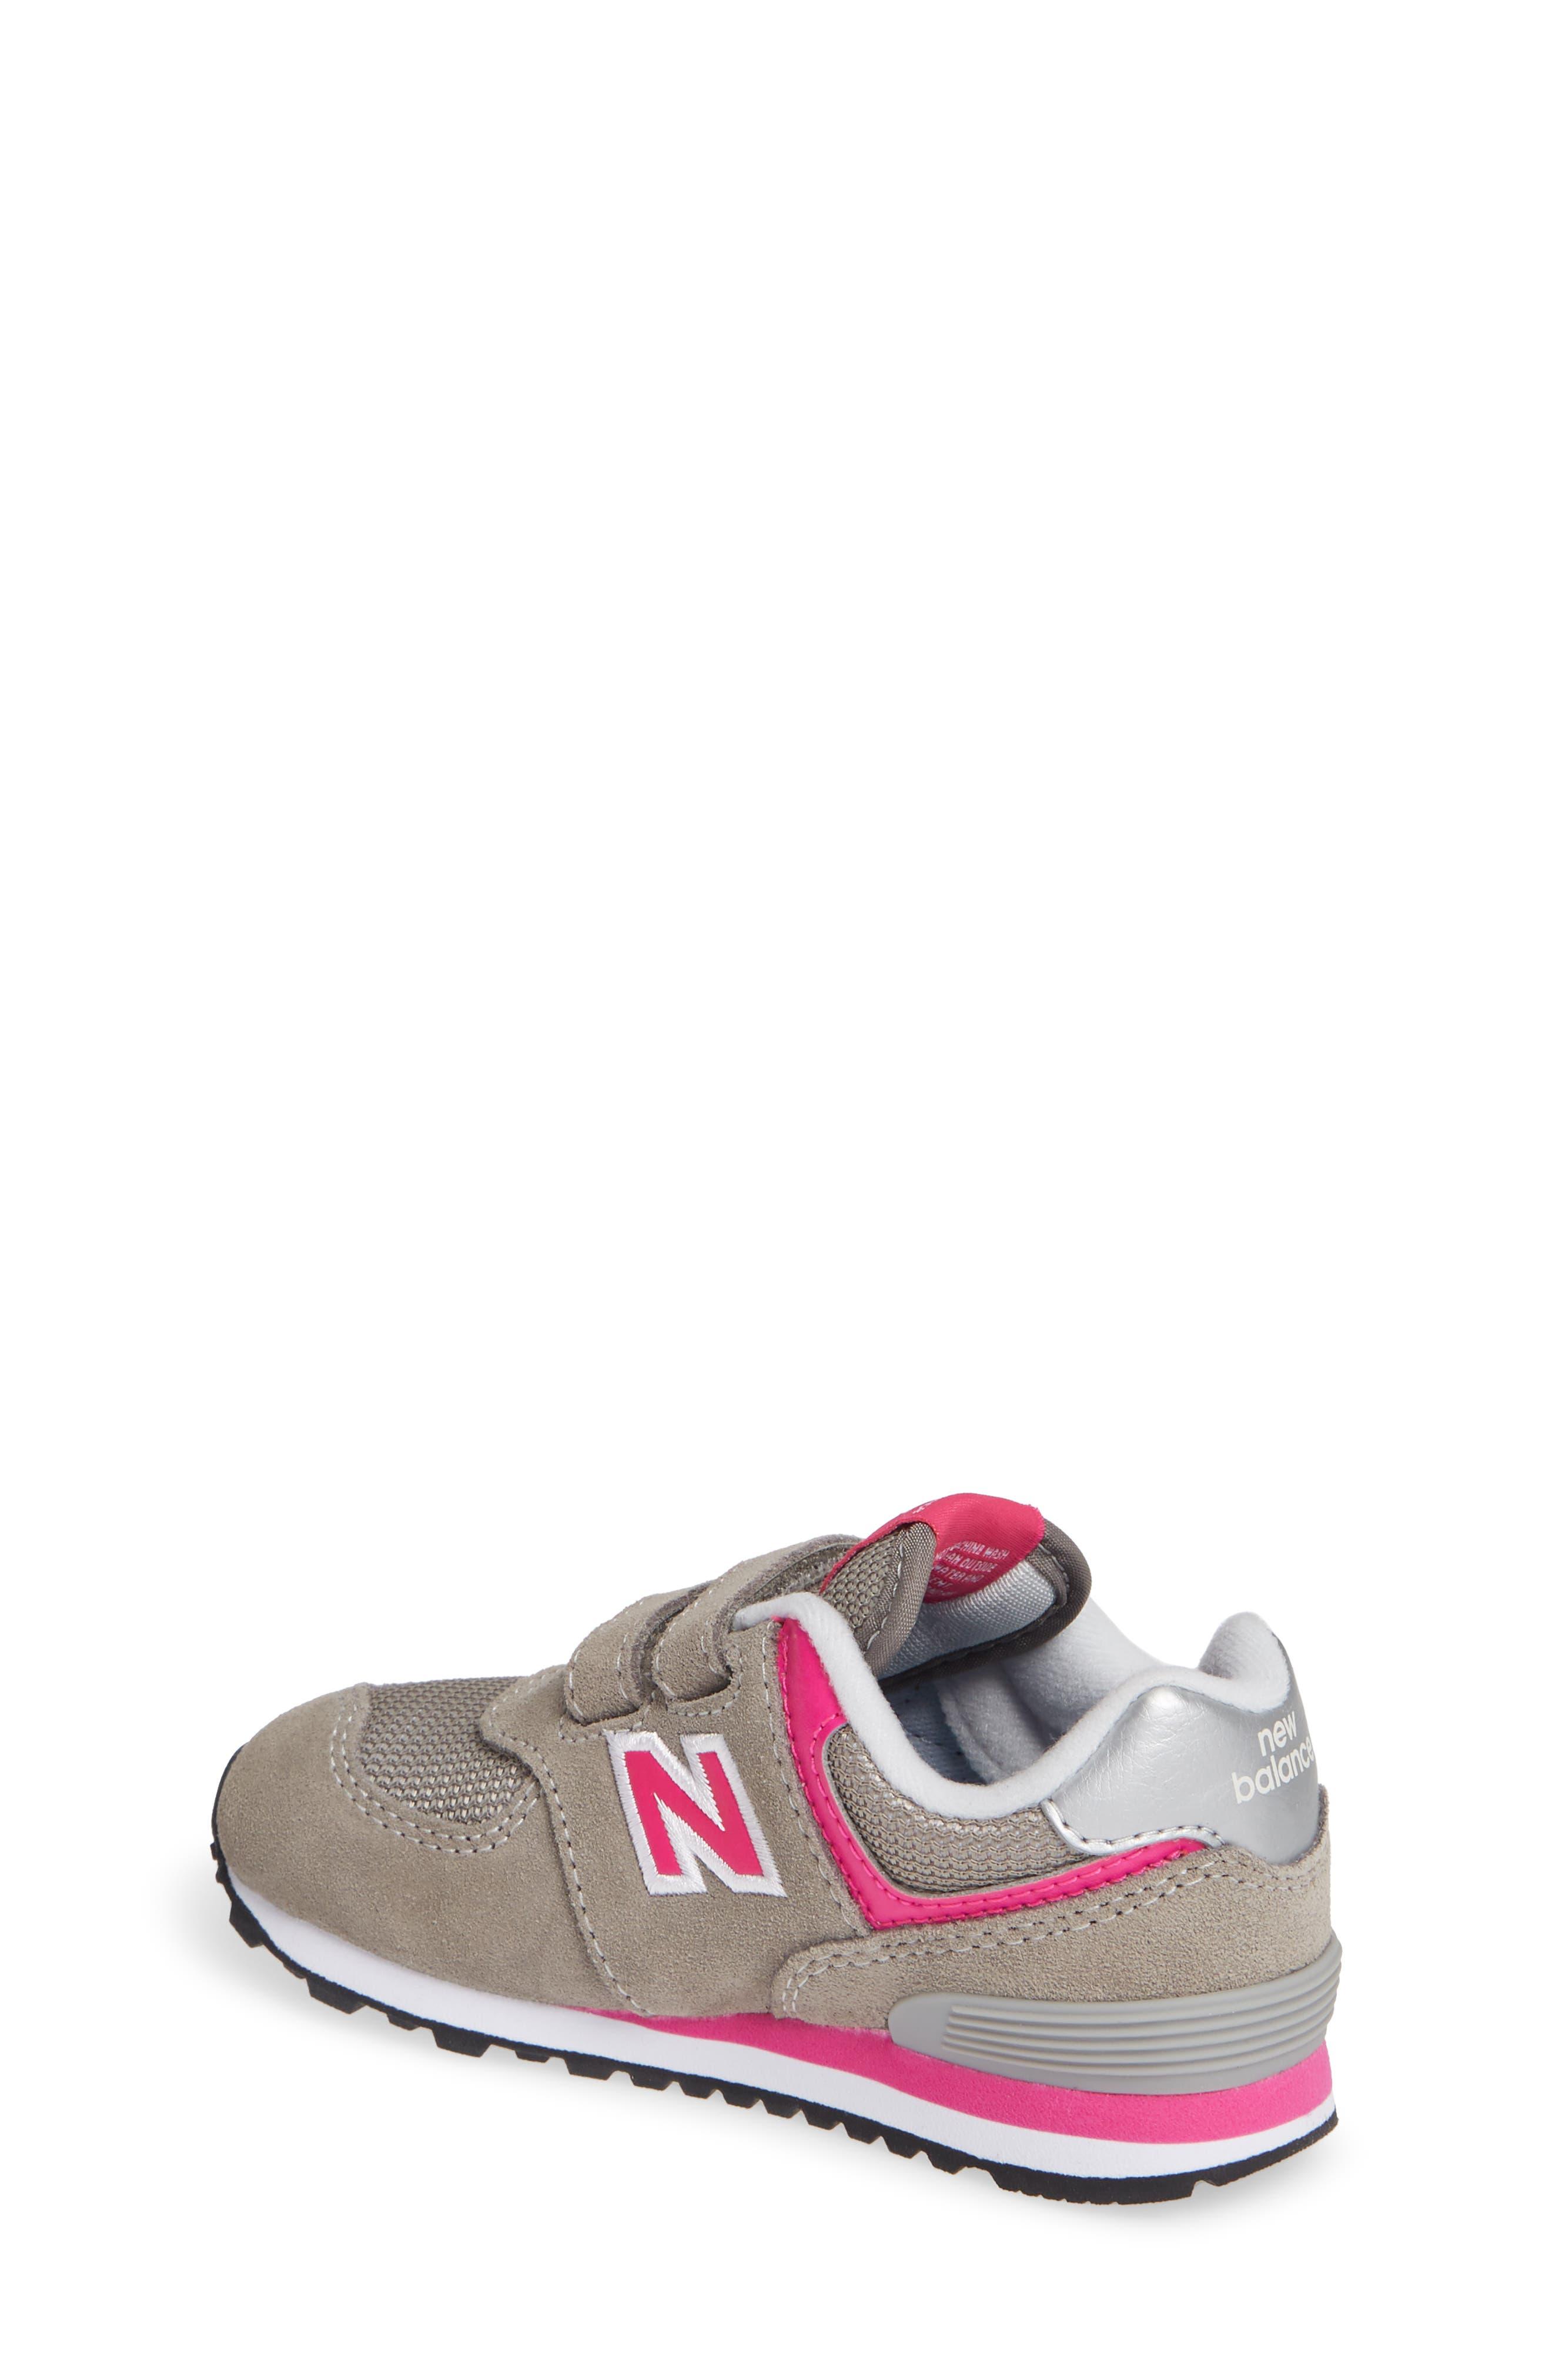 NEW BALANCE, '574 Core' Sneaker, Alternate thumbnail 2, color, GREY/ PINK